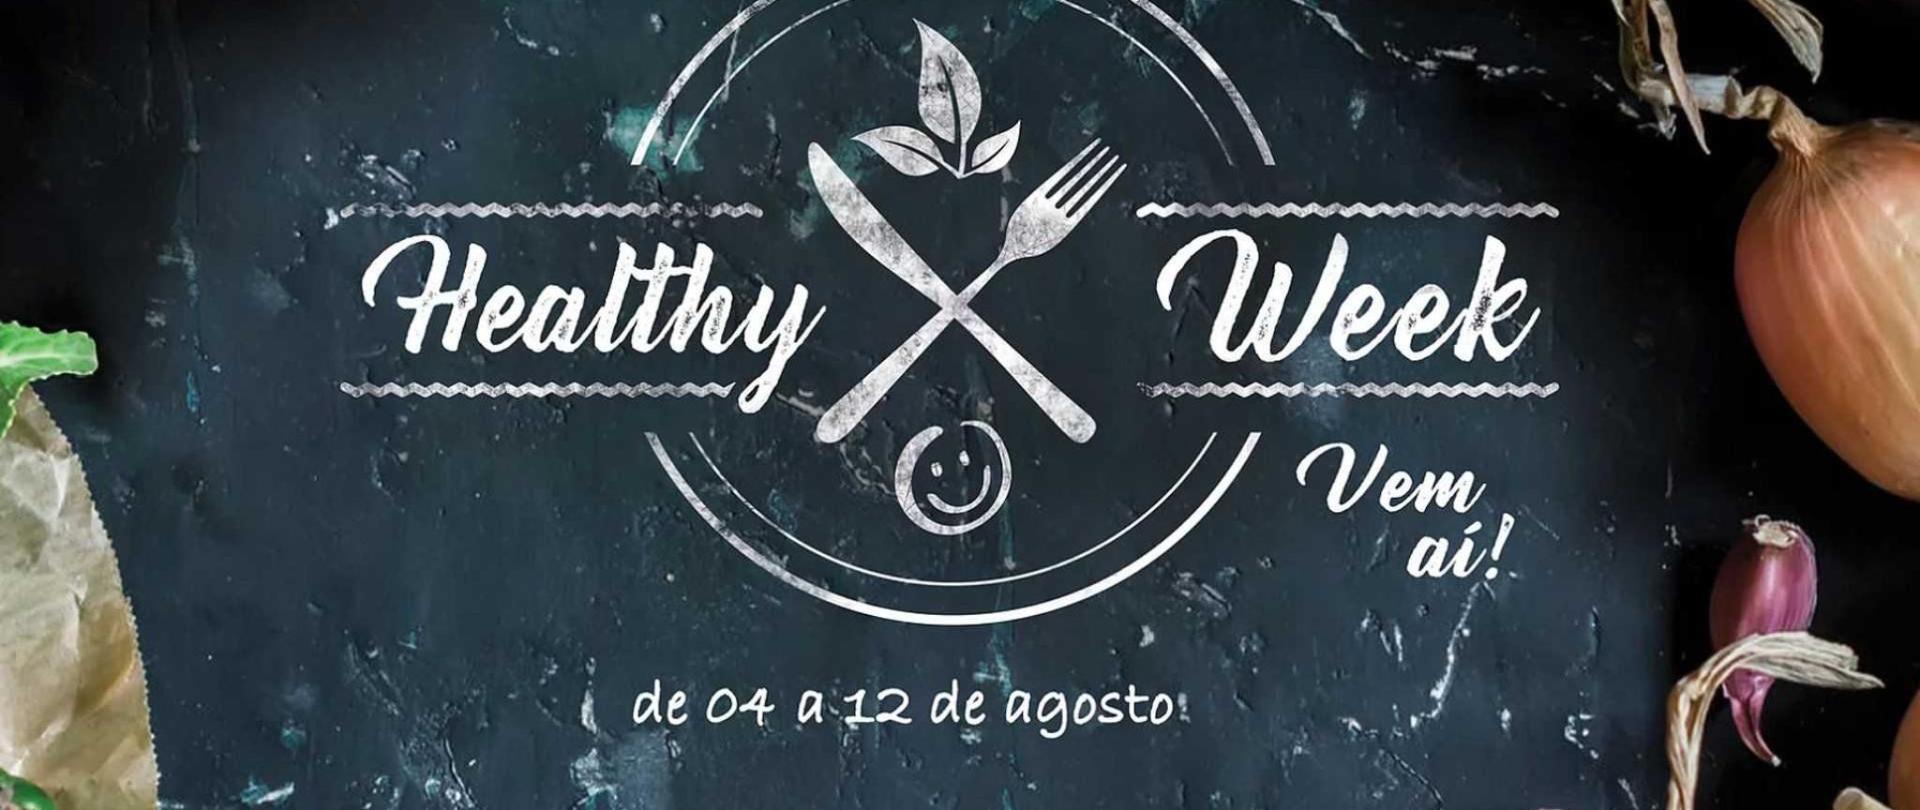 healthy-week-fazenda-coronel-jacinto-1.jpg